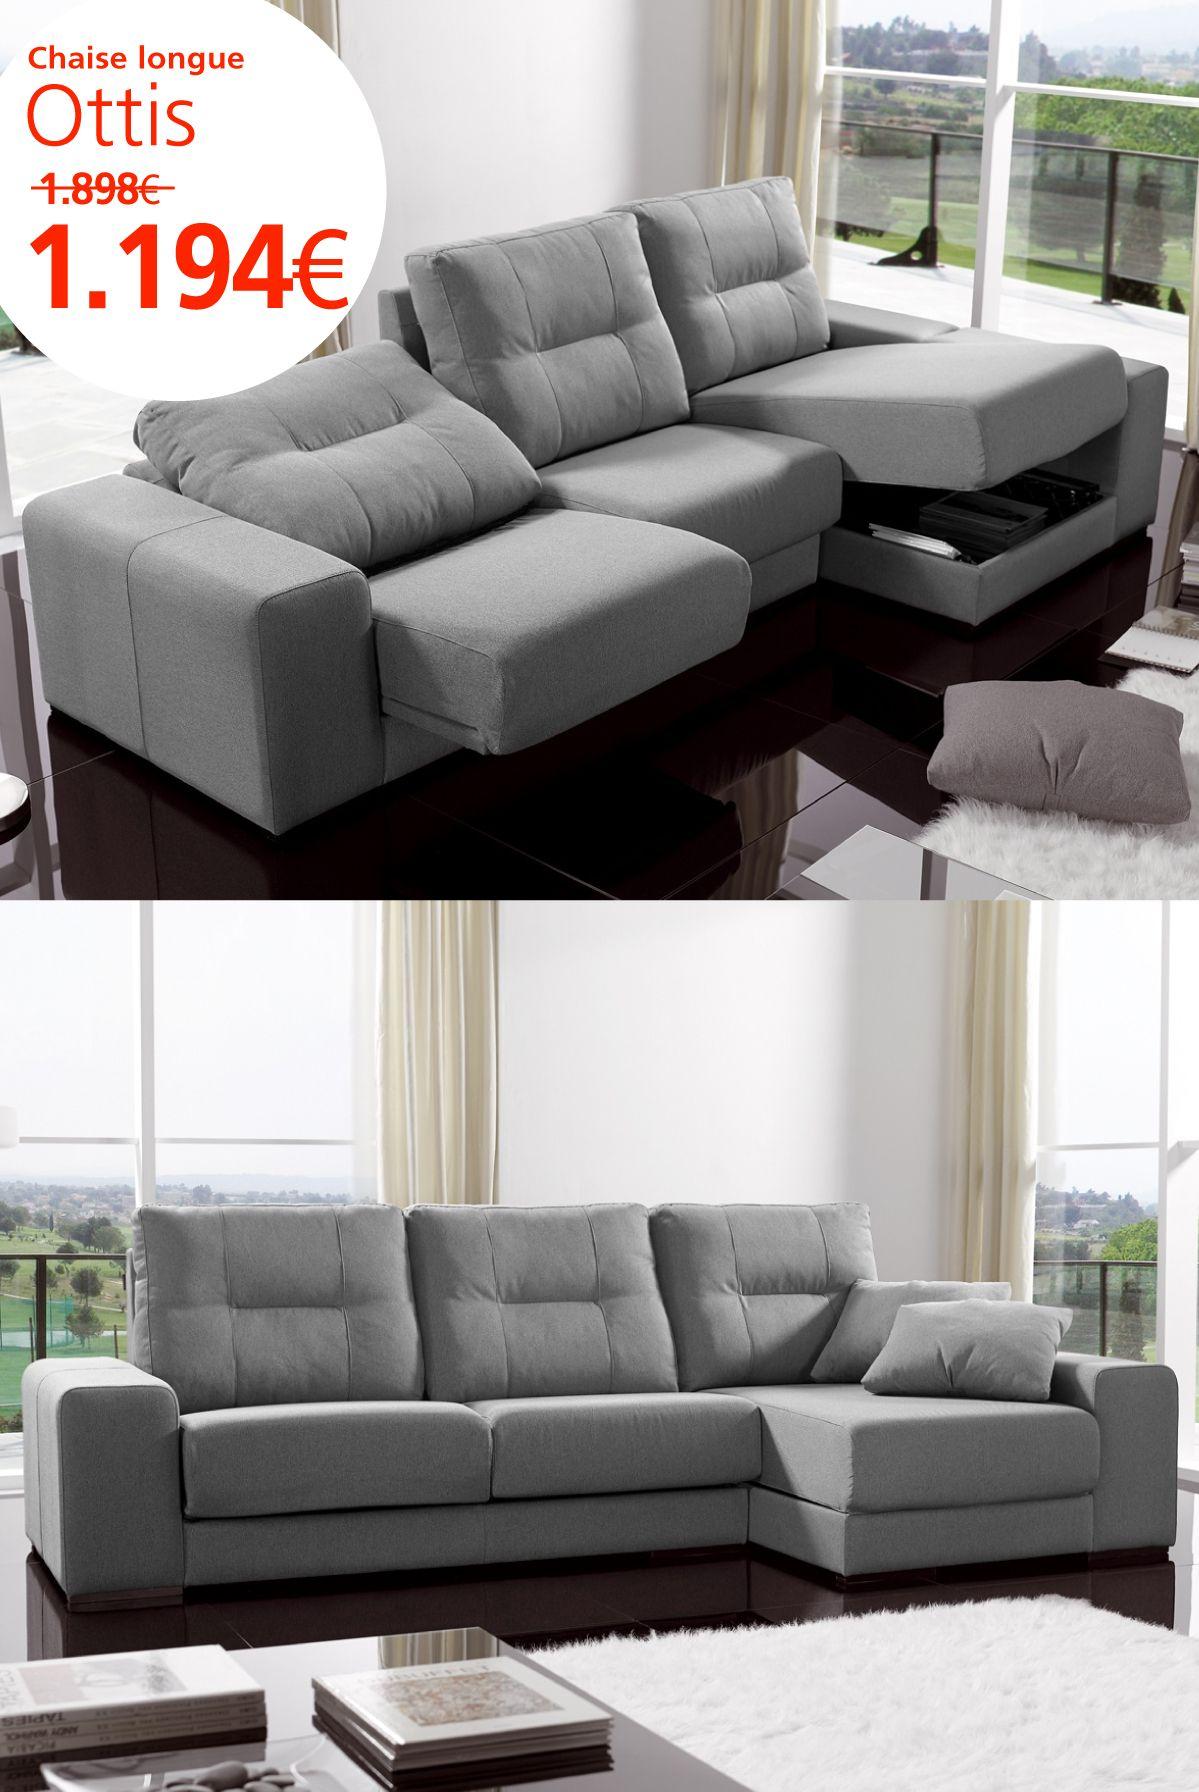 Chaise longue Ottis ▻ bit.ly/1uXVn6v #sofa #chaiselongue ...